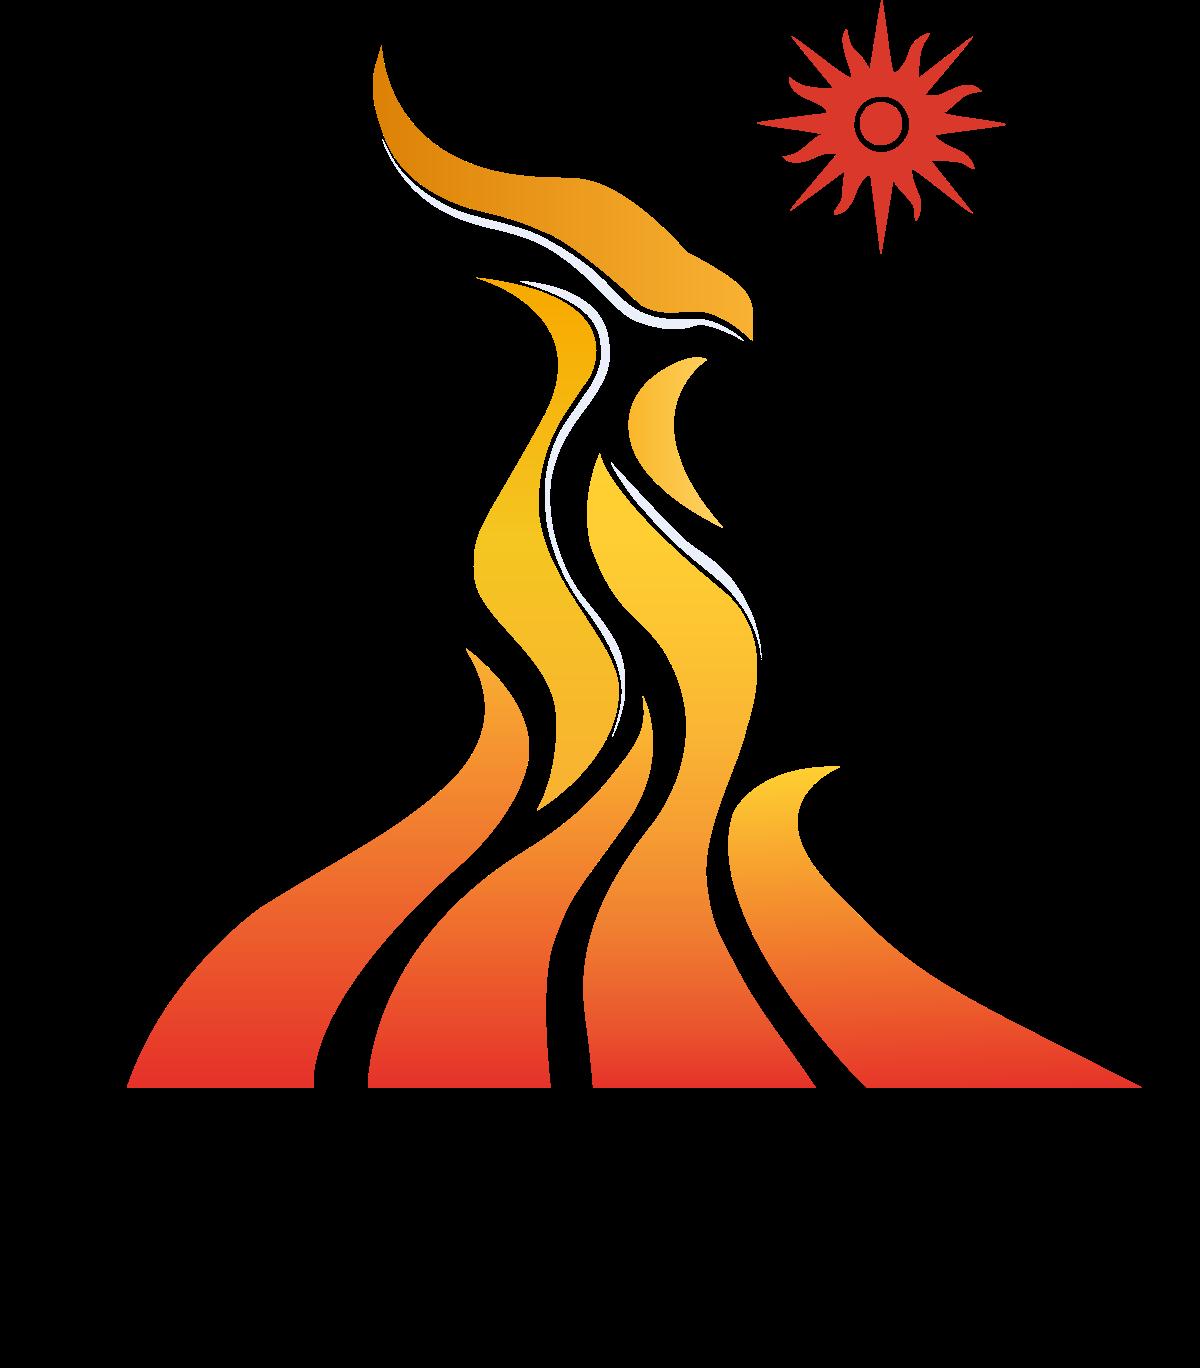 asian games wikipedia. Olympics clipart olympic cauldron